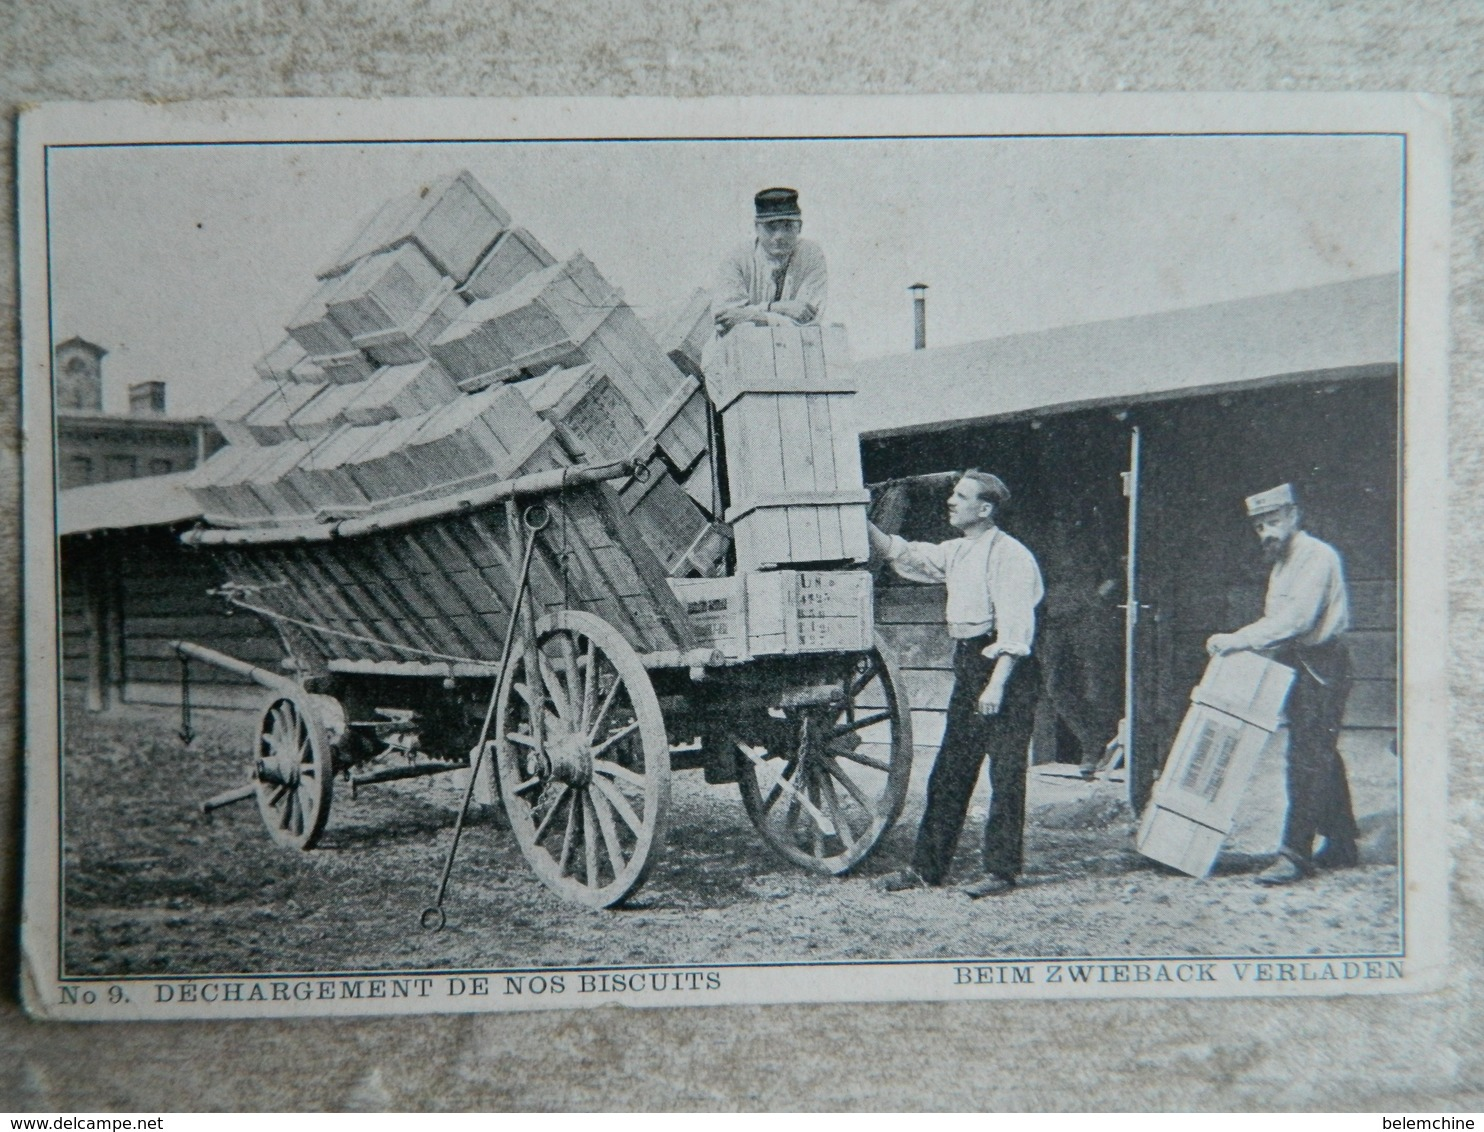 CAMP DE PRISONNIERS EN ALLEMAGNE  (PUSCHHEIM BAVIERE)   DECHARGEMENT DE NOS BISCUITS - Guerre 1914-18